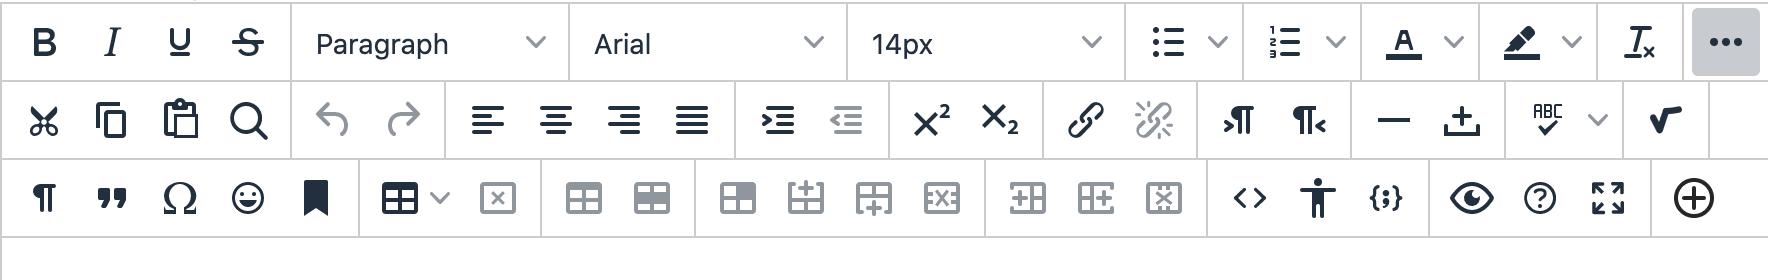 New Blackboard Content Editor